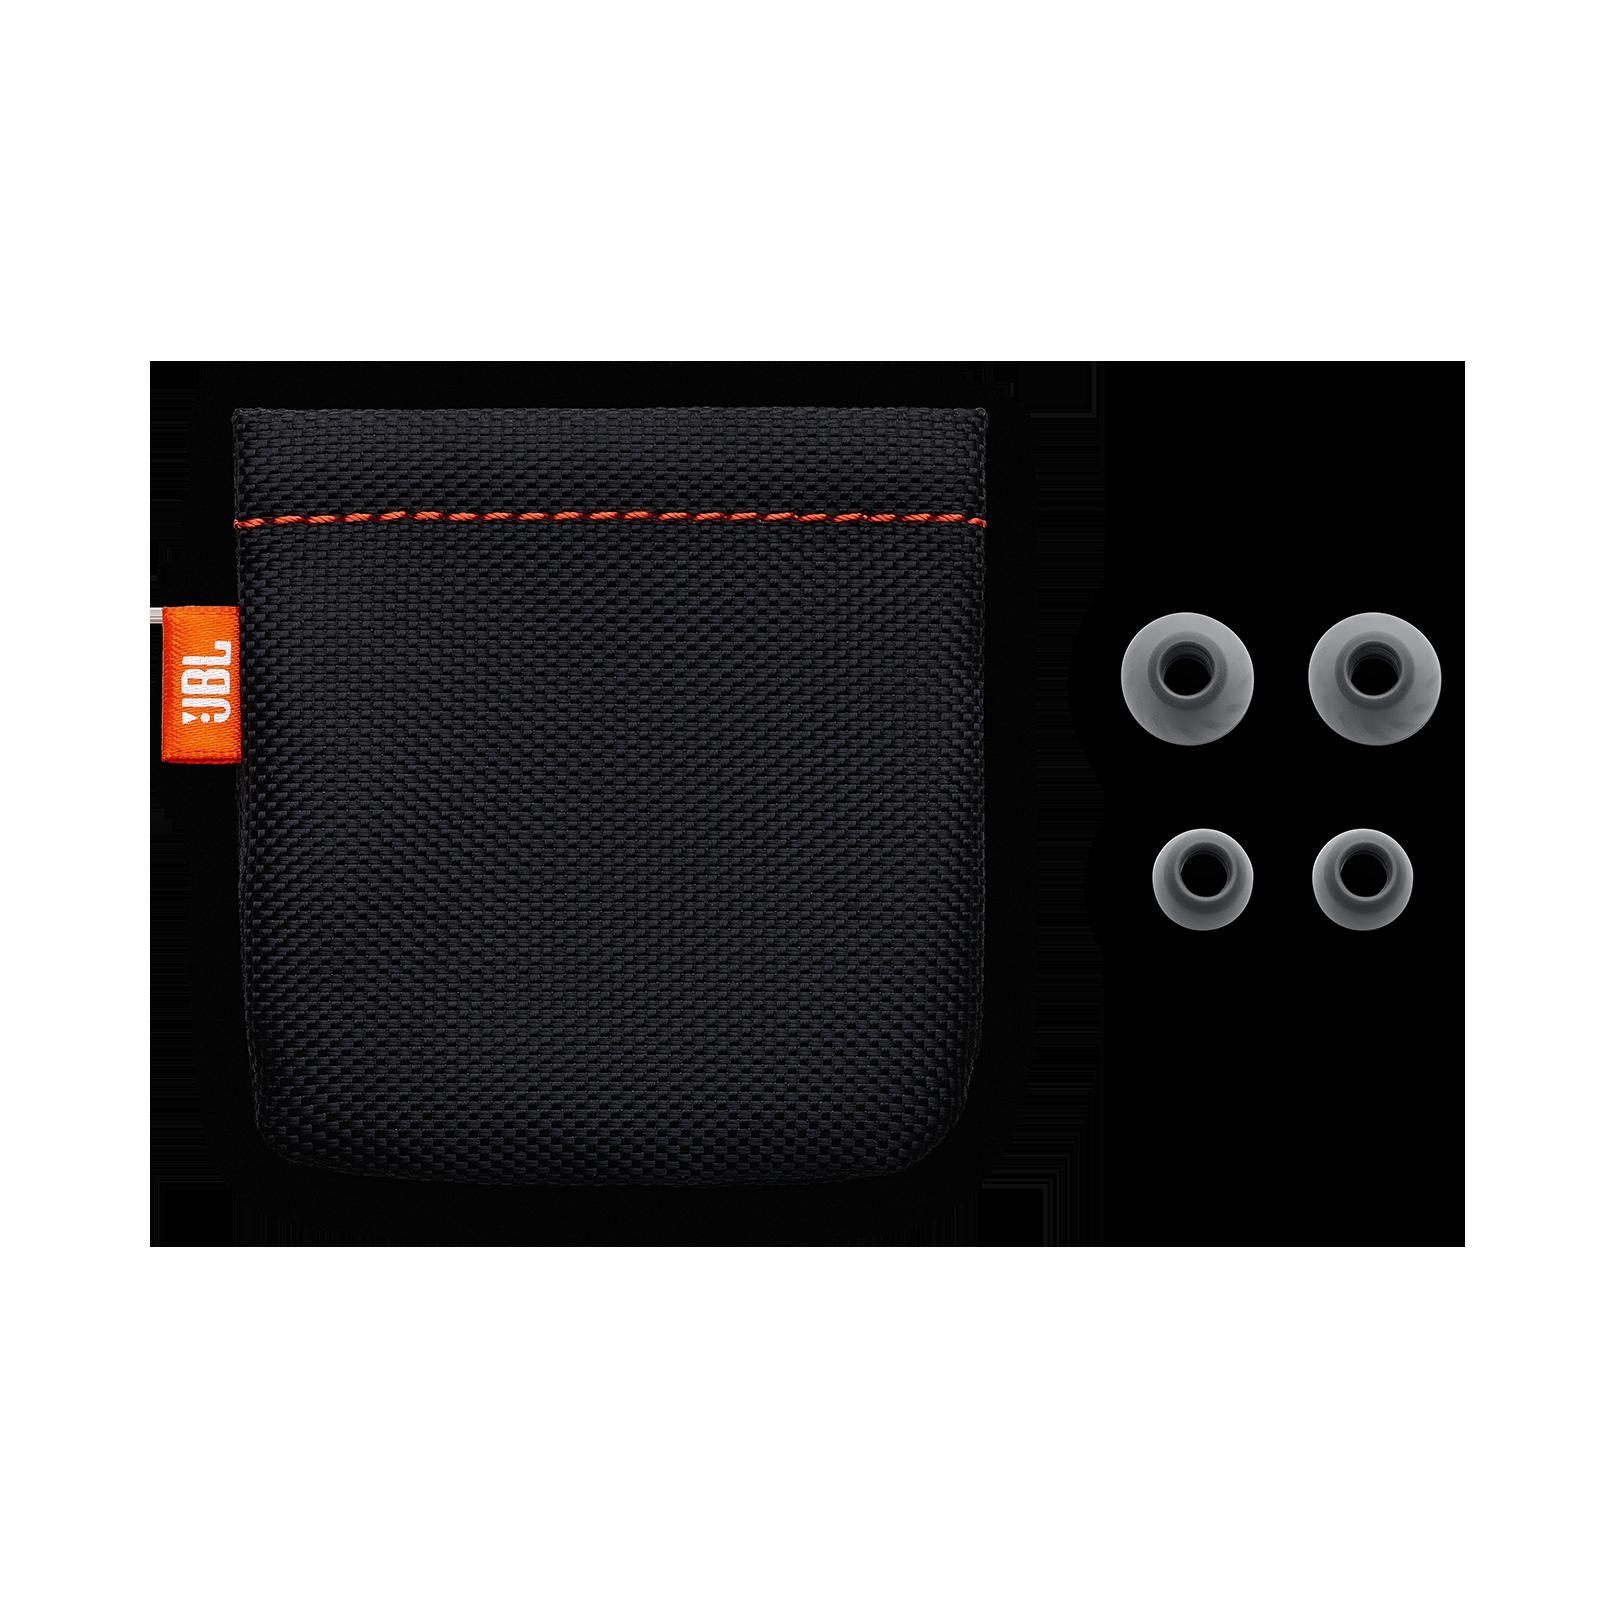 JBL LIVE 100 - Black - In-ear headphones - Detailshot 3